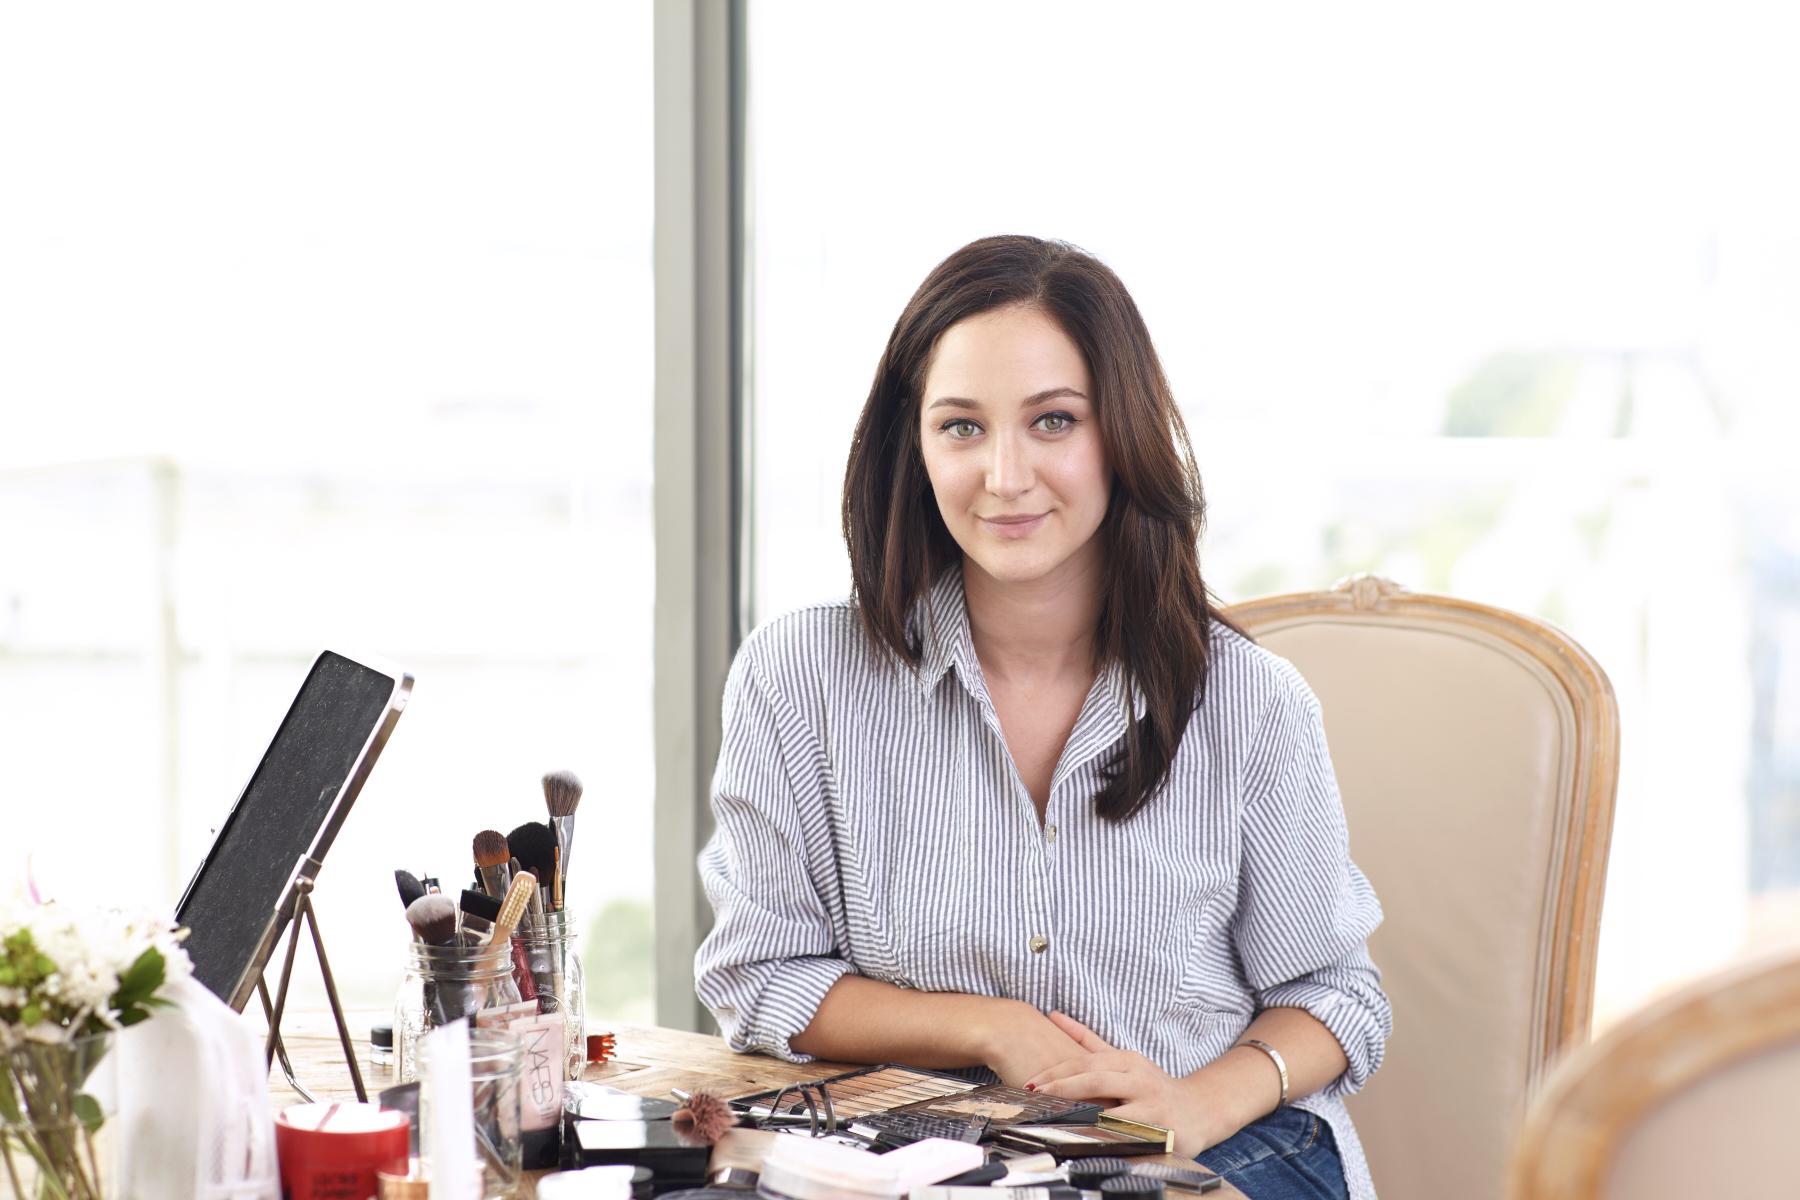 Dana Rae Ashburn, Makeup Artist